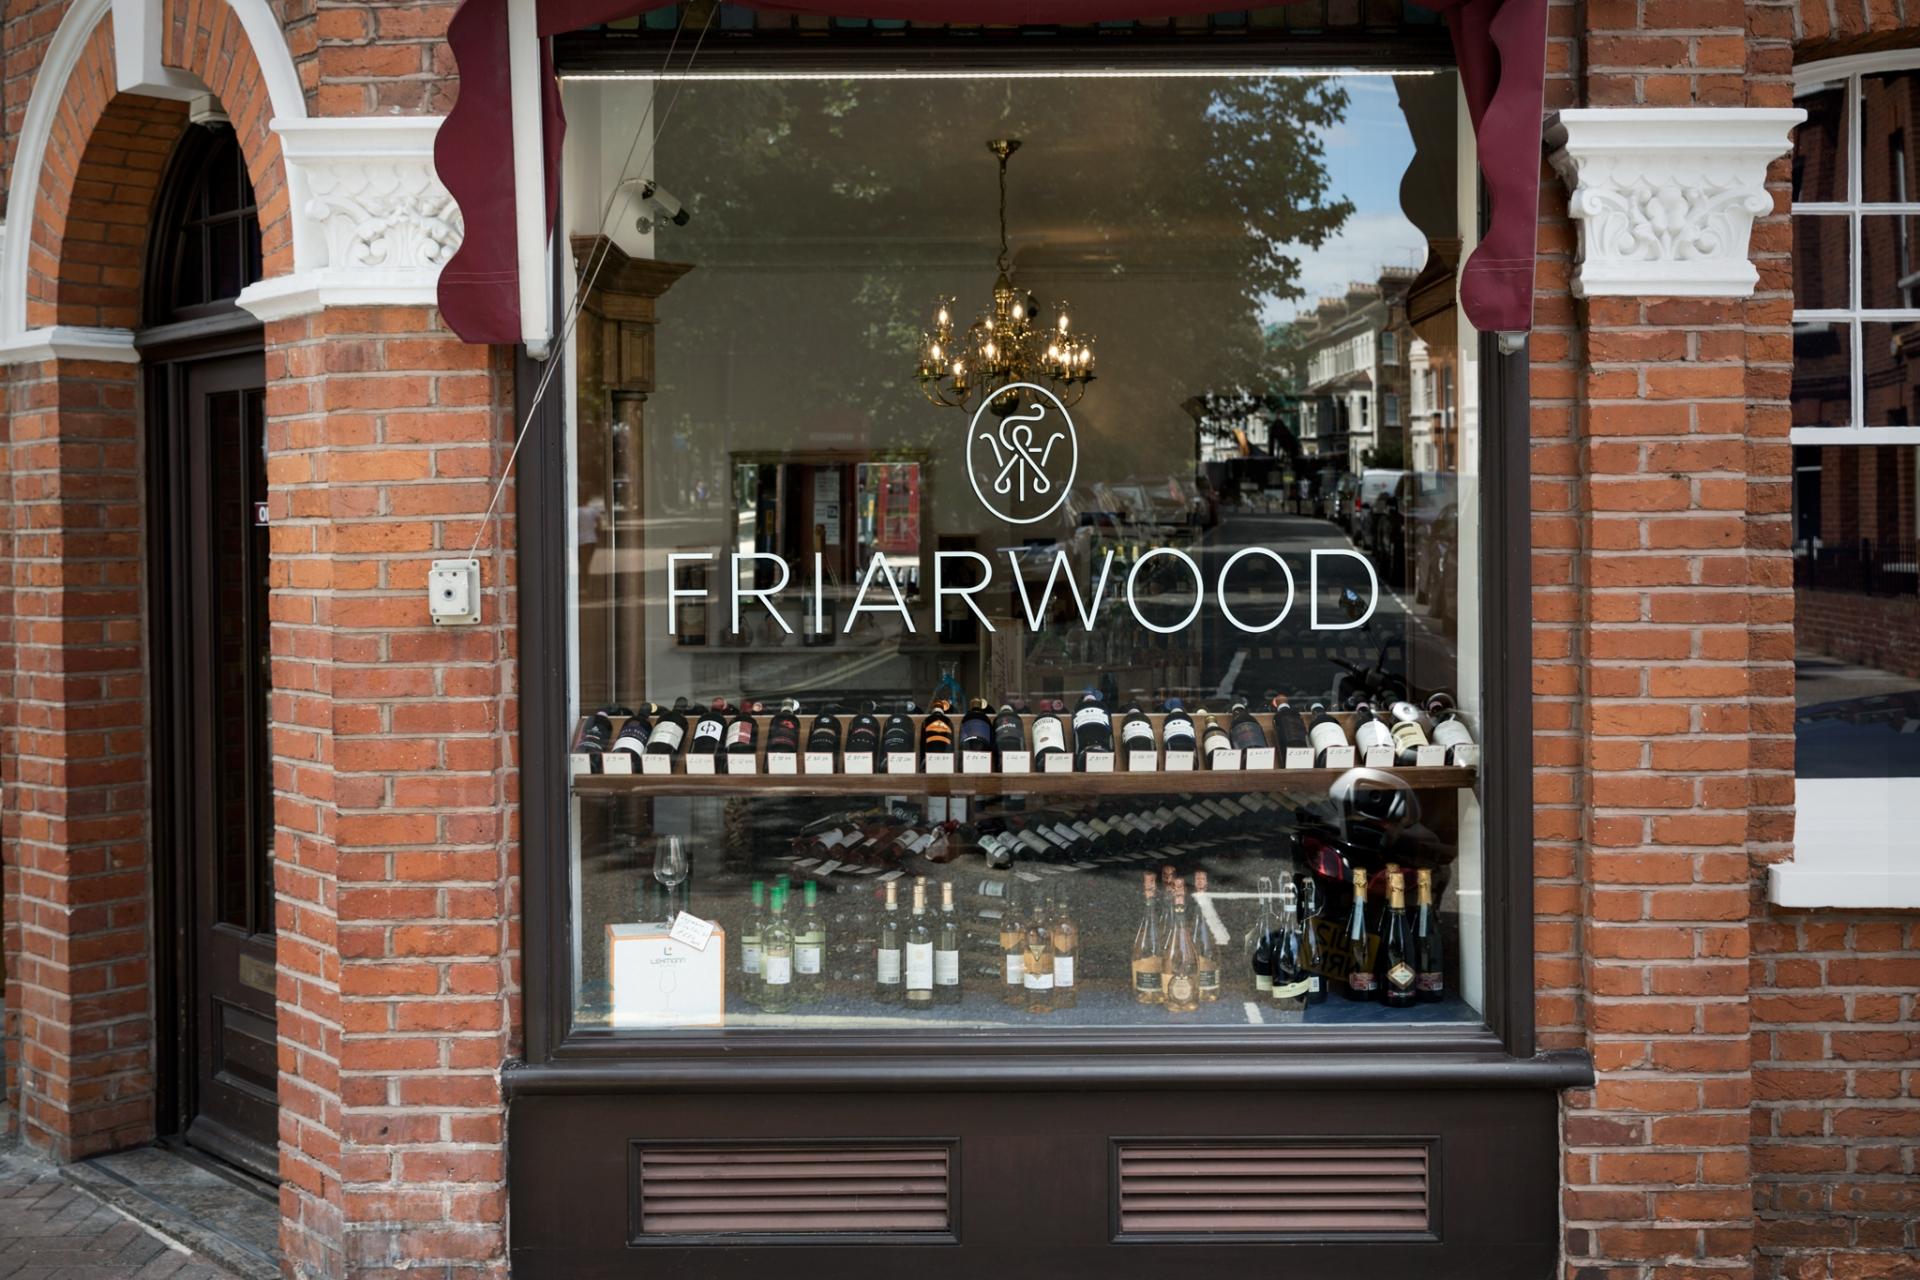 Patrick Fry Studio Friarwood